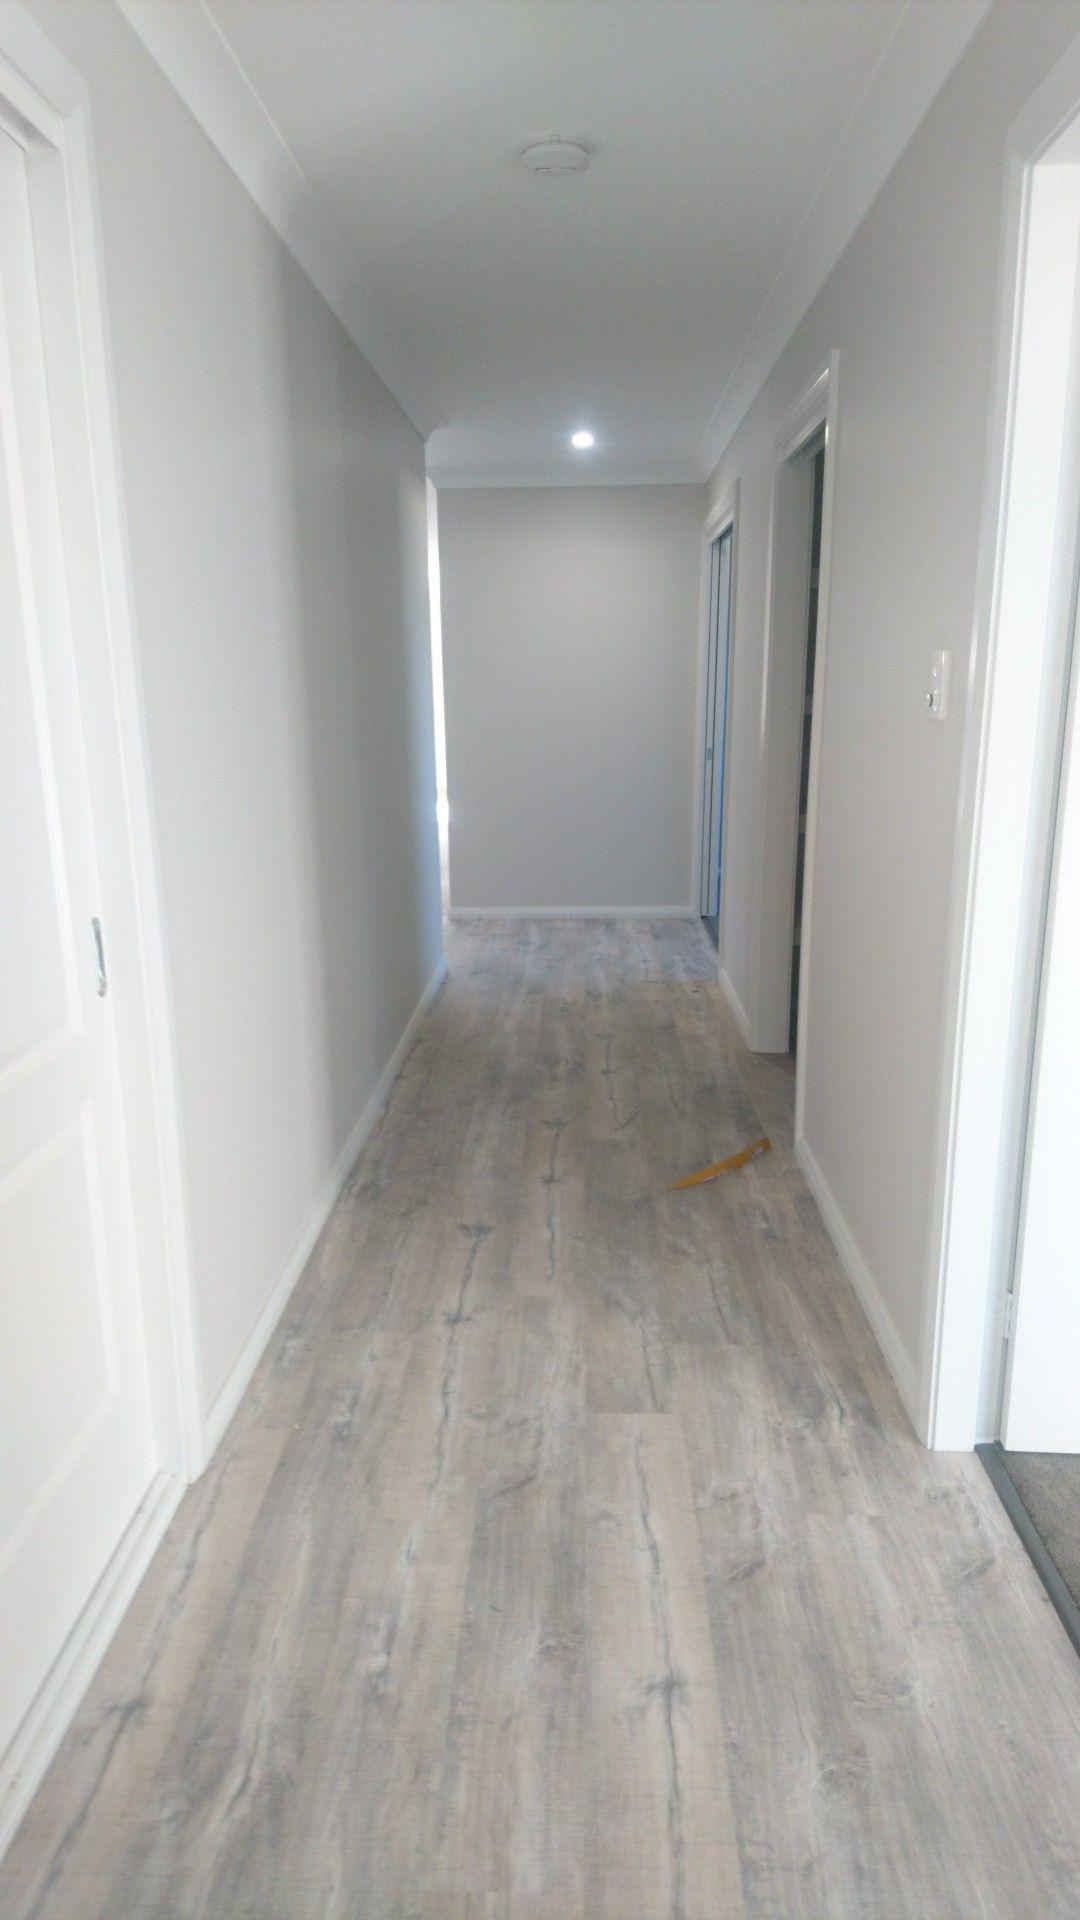 Entrance Hallway Vinyl Planks New Home Might Put Some